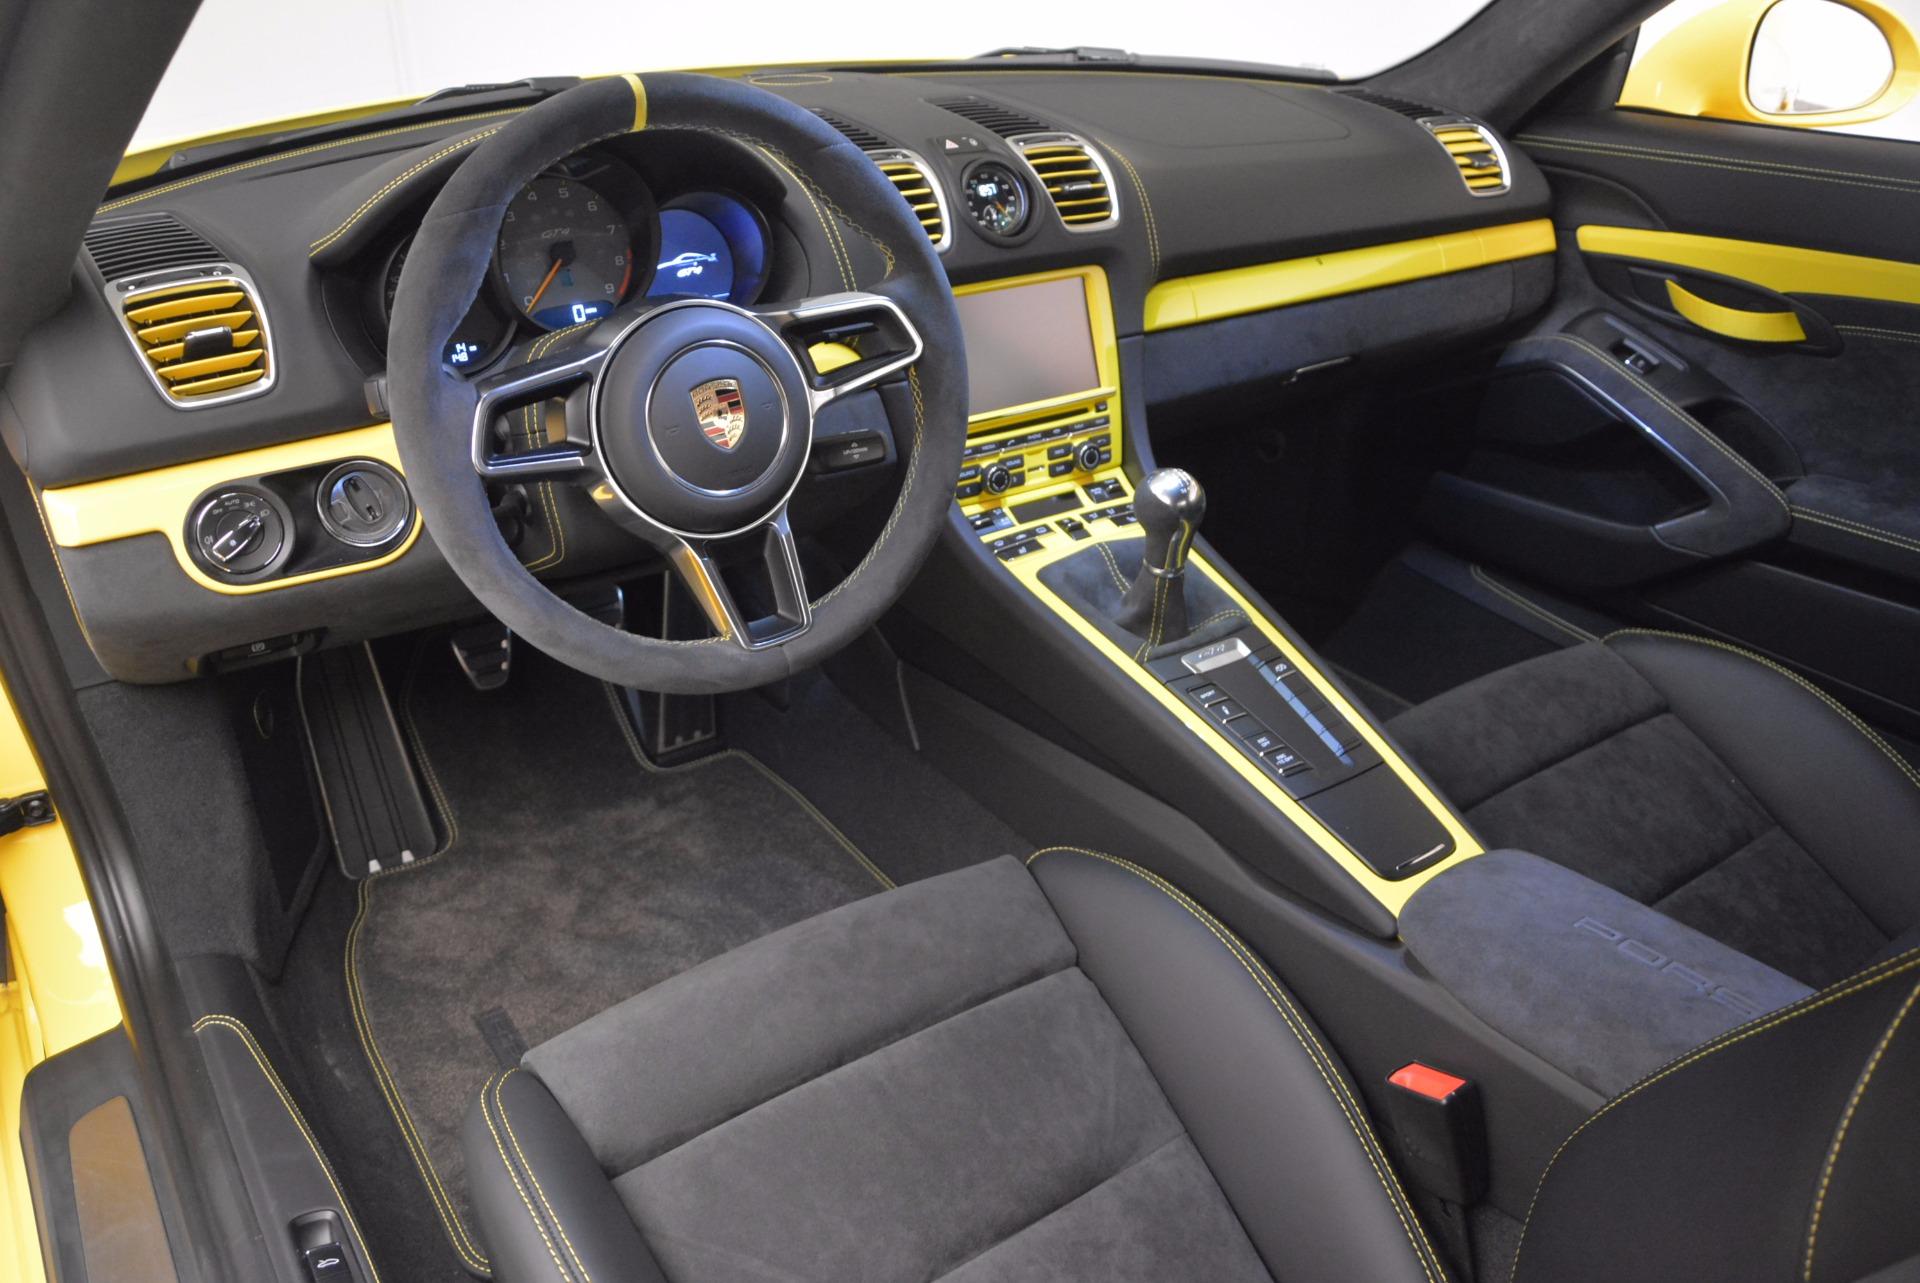 Used 2016 Porsche Cayman GT4 For Sale In Greenwich, CT. Alfa Romeo of Greenwich, 7240 1401_p13